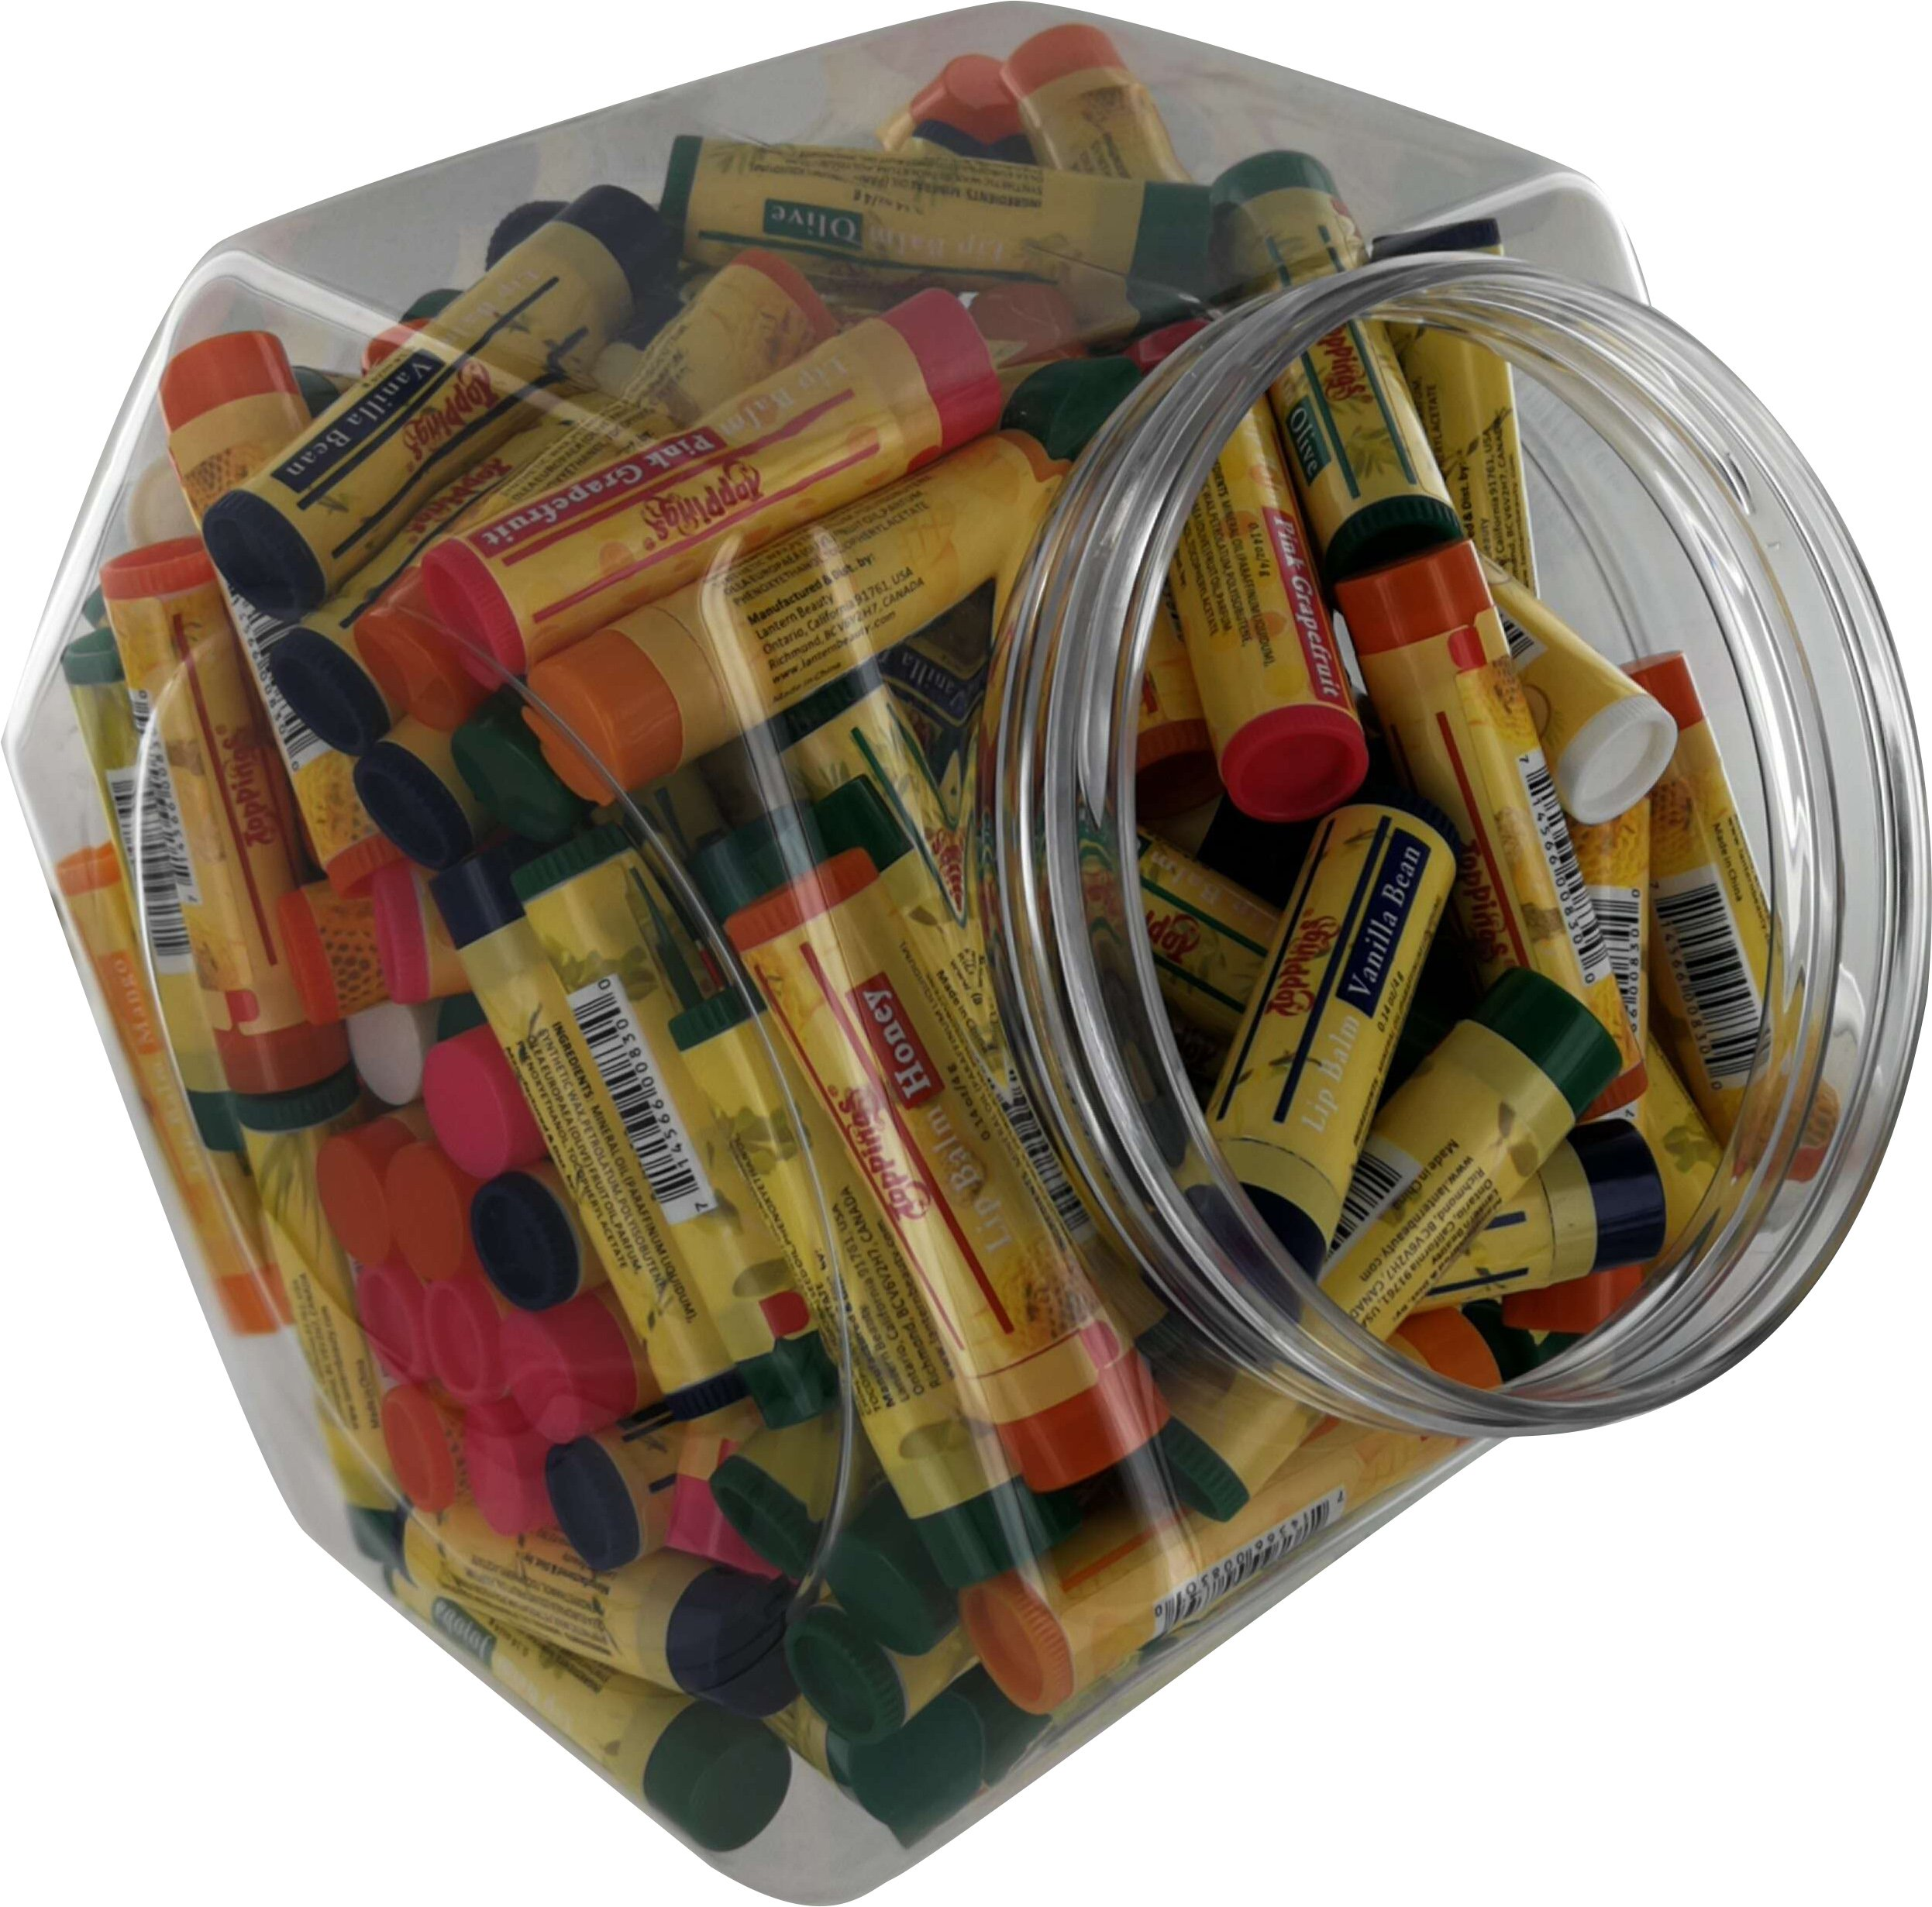 Lip Balm Assortment - 144 pcs. (Jar)